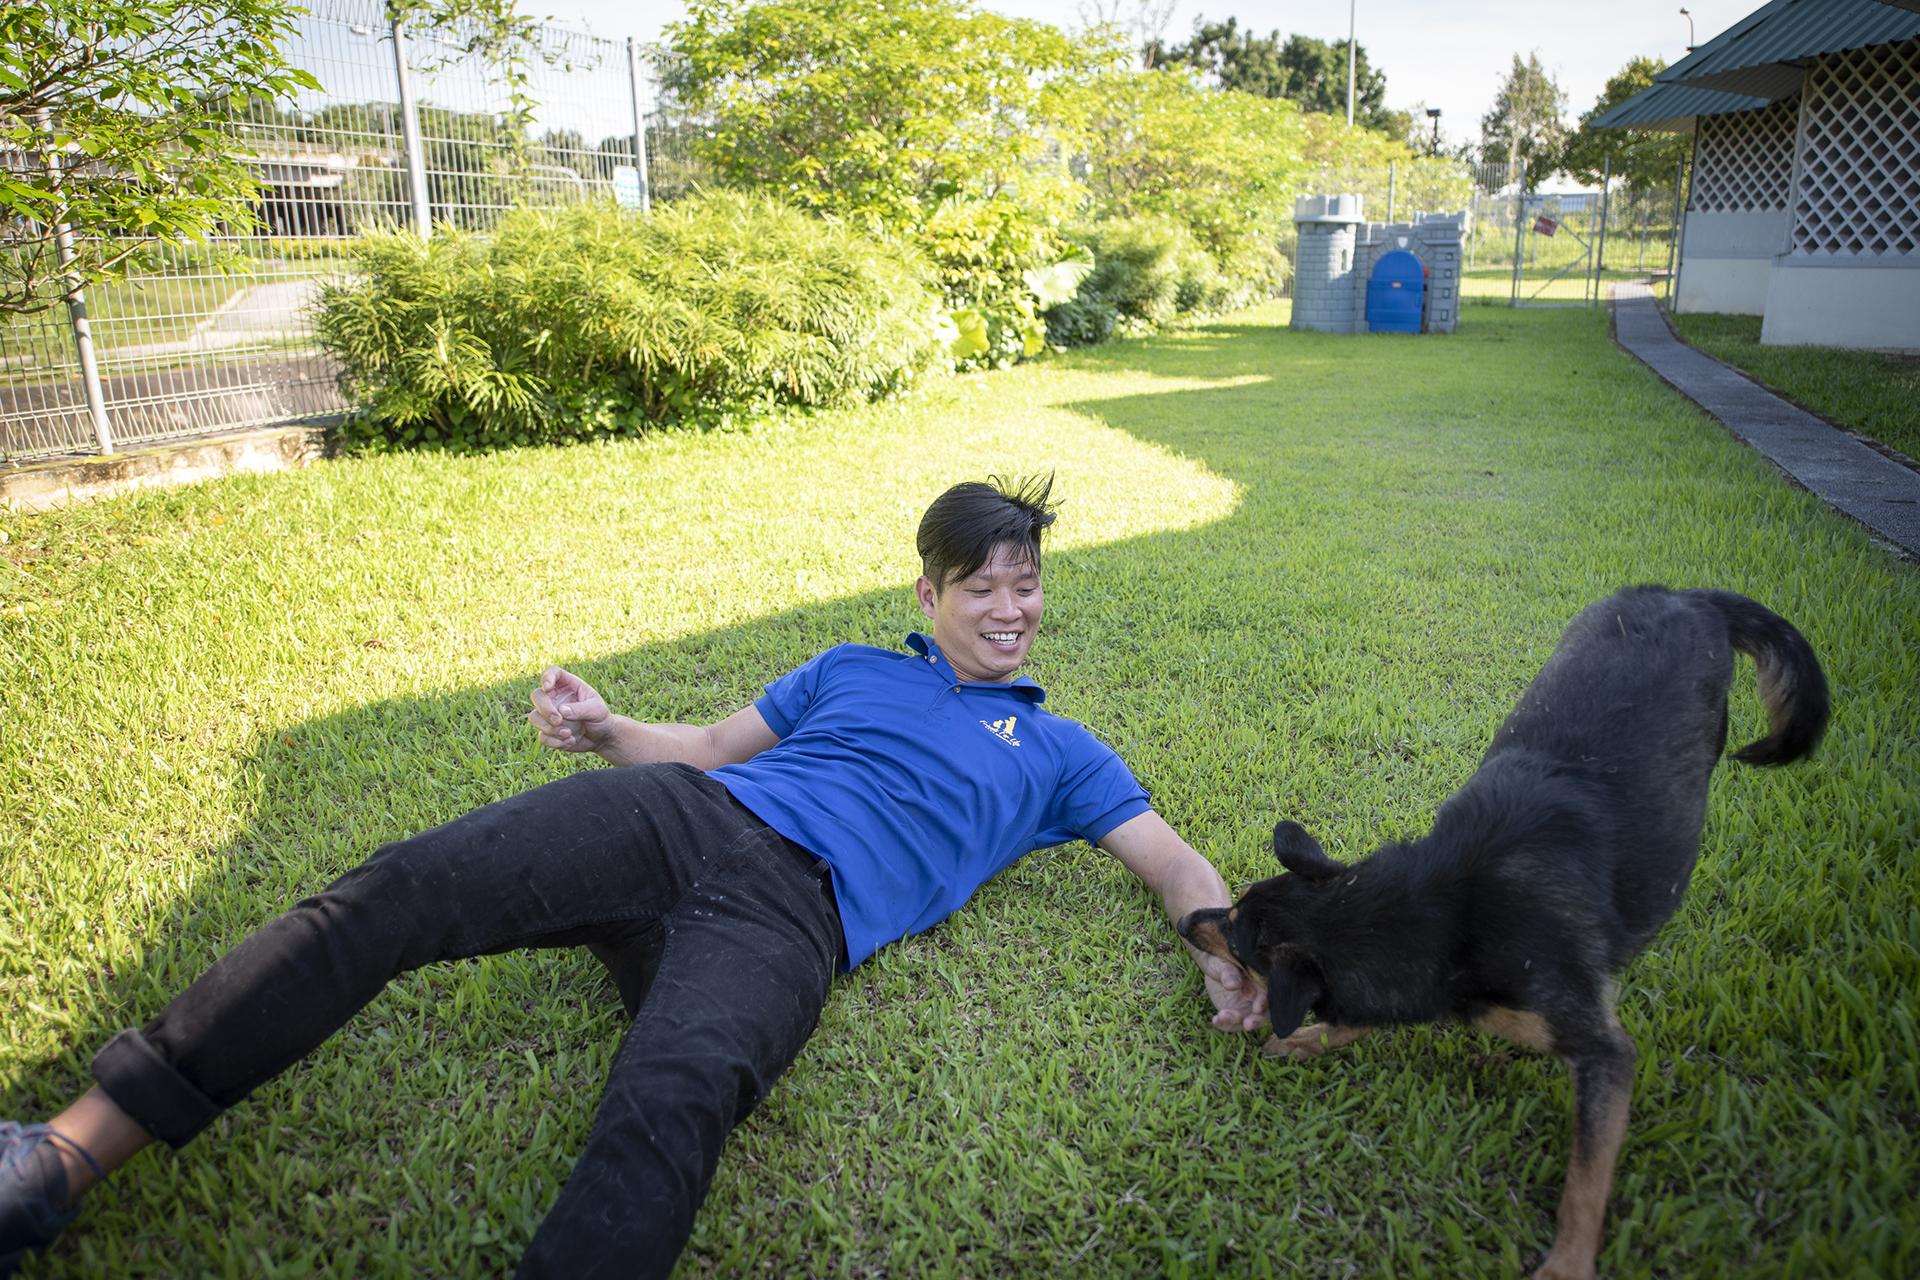 Yao Huang, shelter supervisor at SPCA Singapore